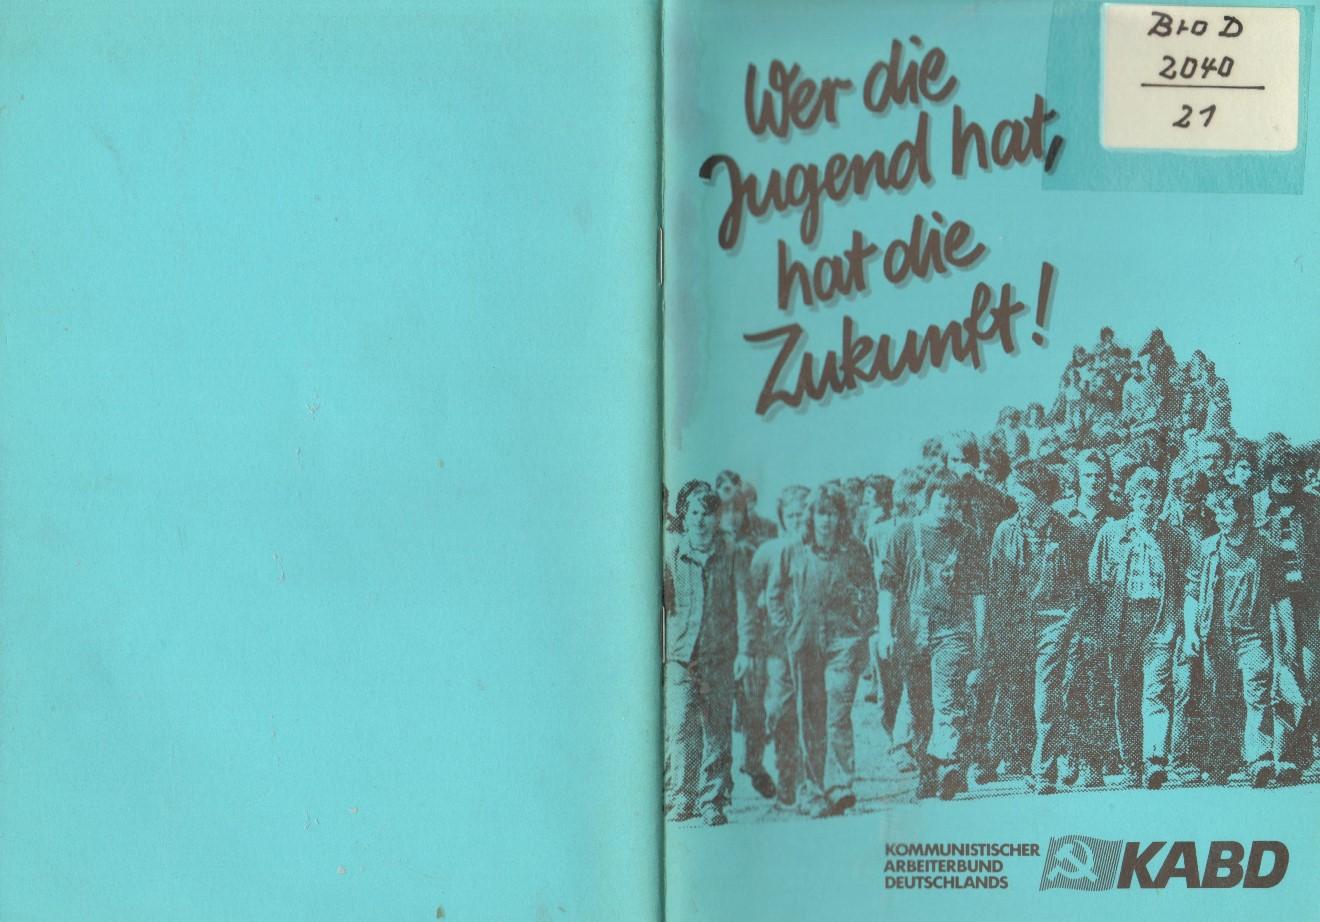 KABD_1977_Jugend_Zukunft_01